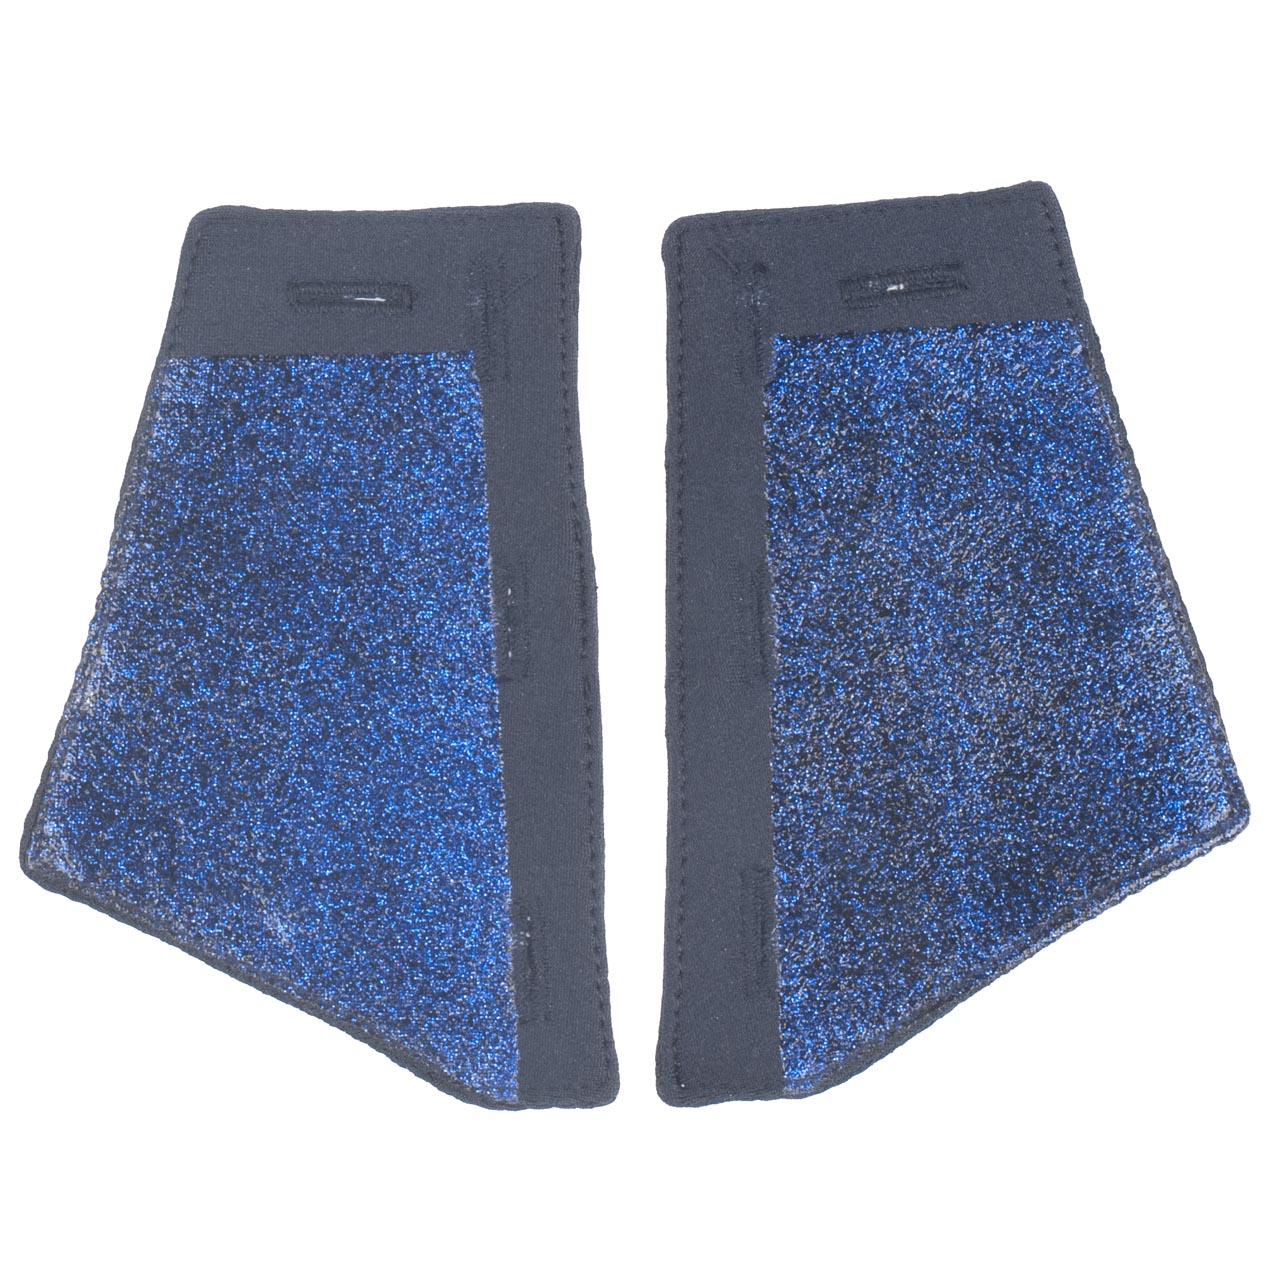 Horka Points&Splts Elegance kinder rijjas donkerblauw